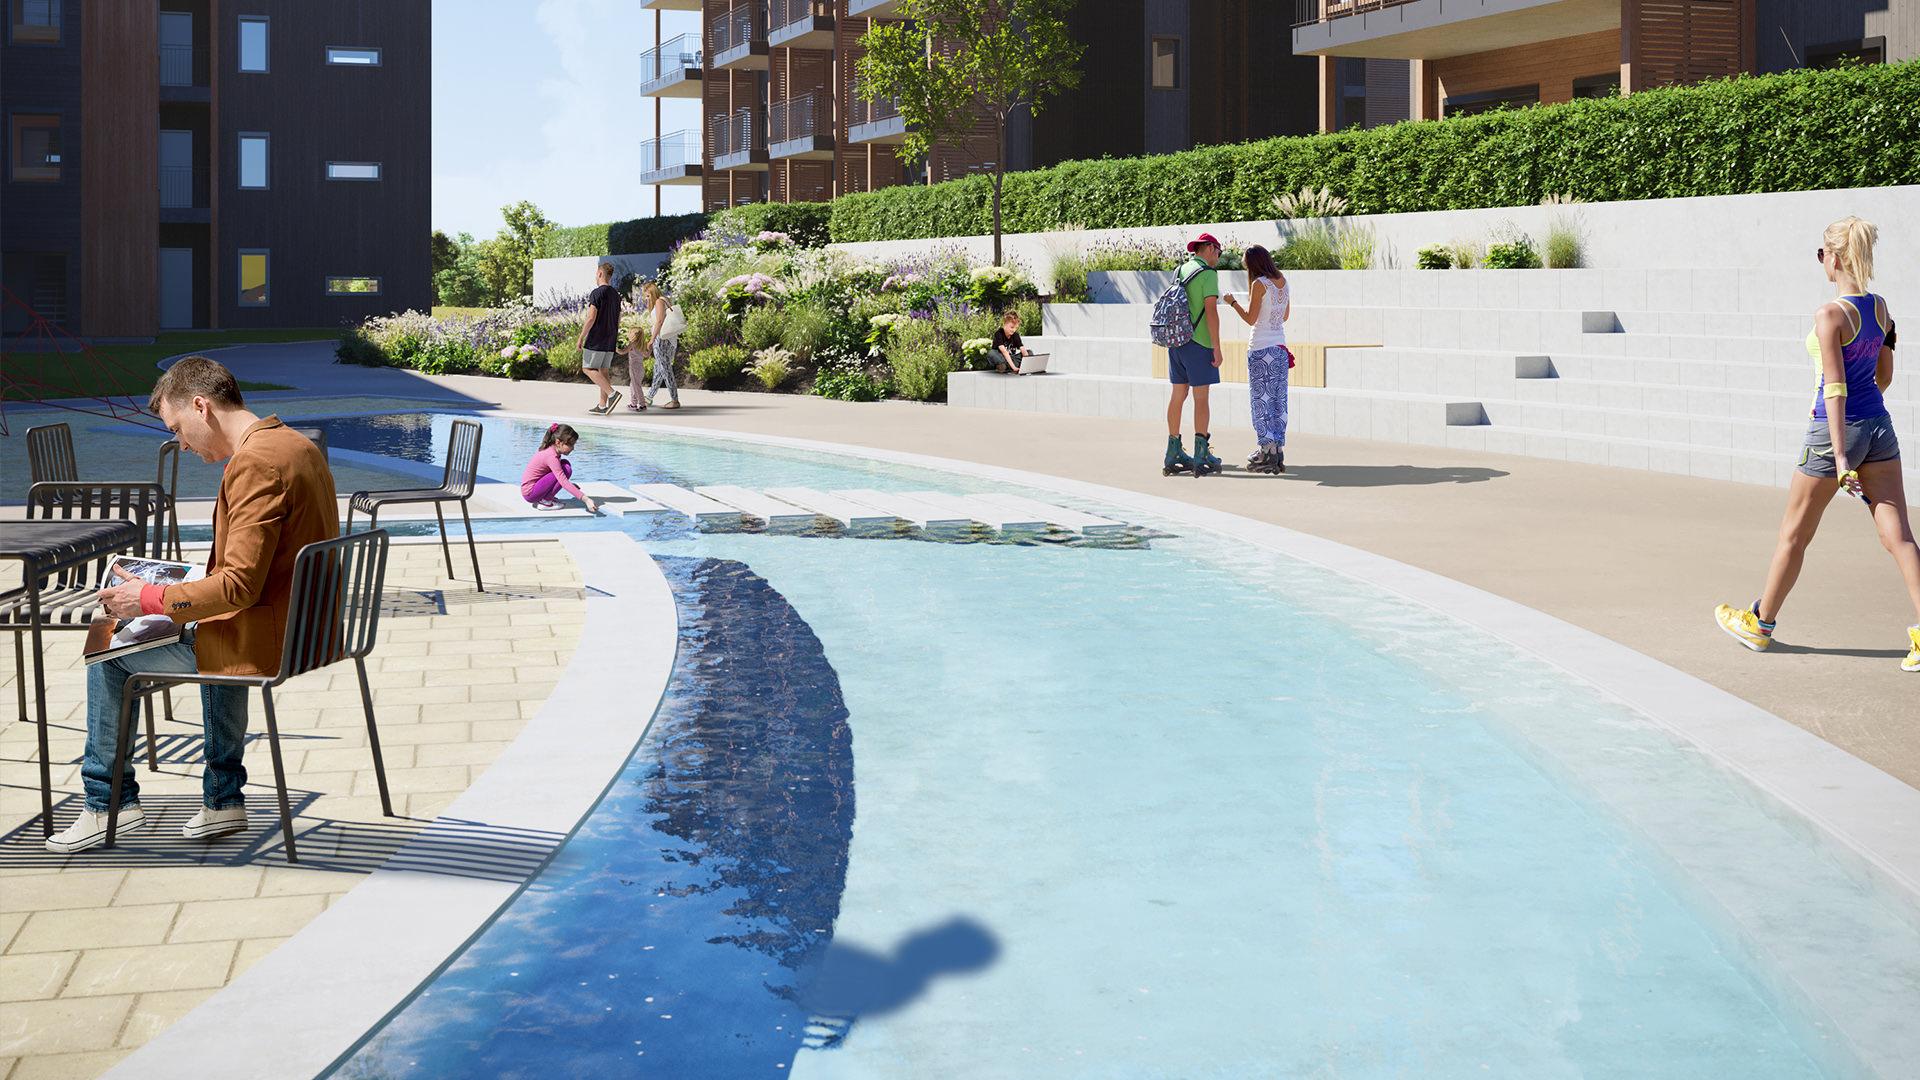 vannspeil boligprosjekt capjon park